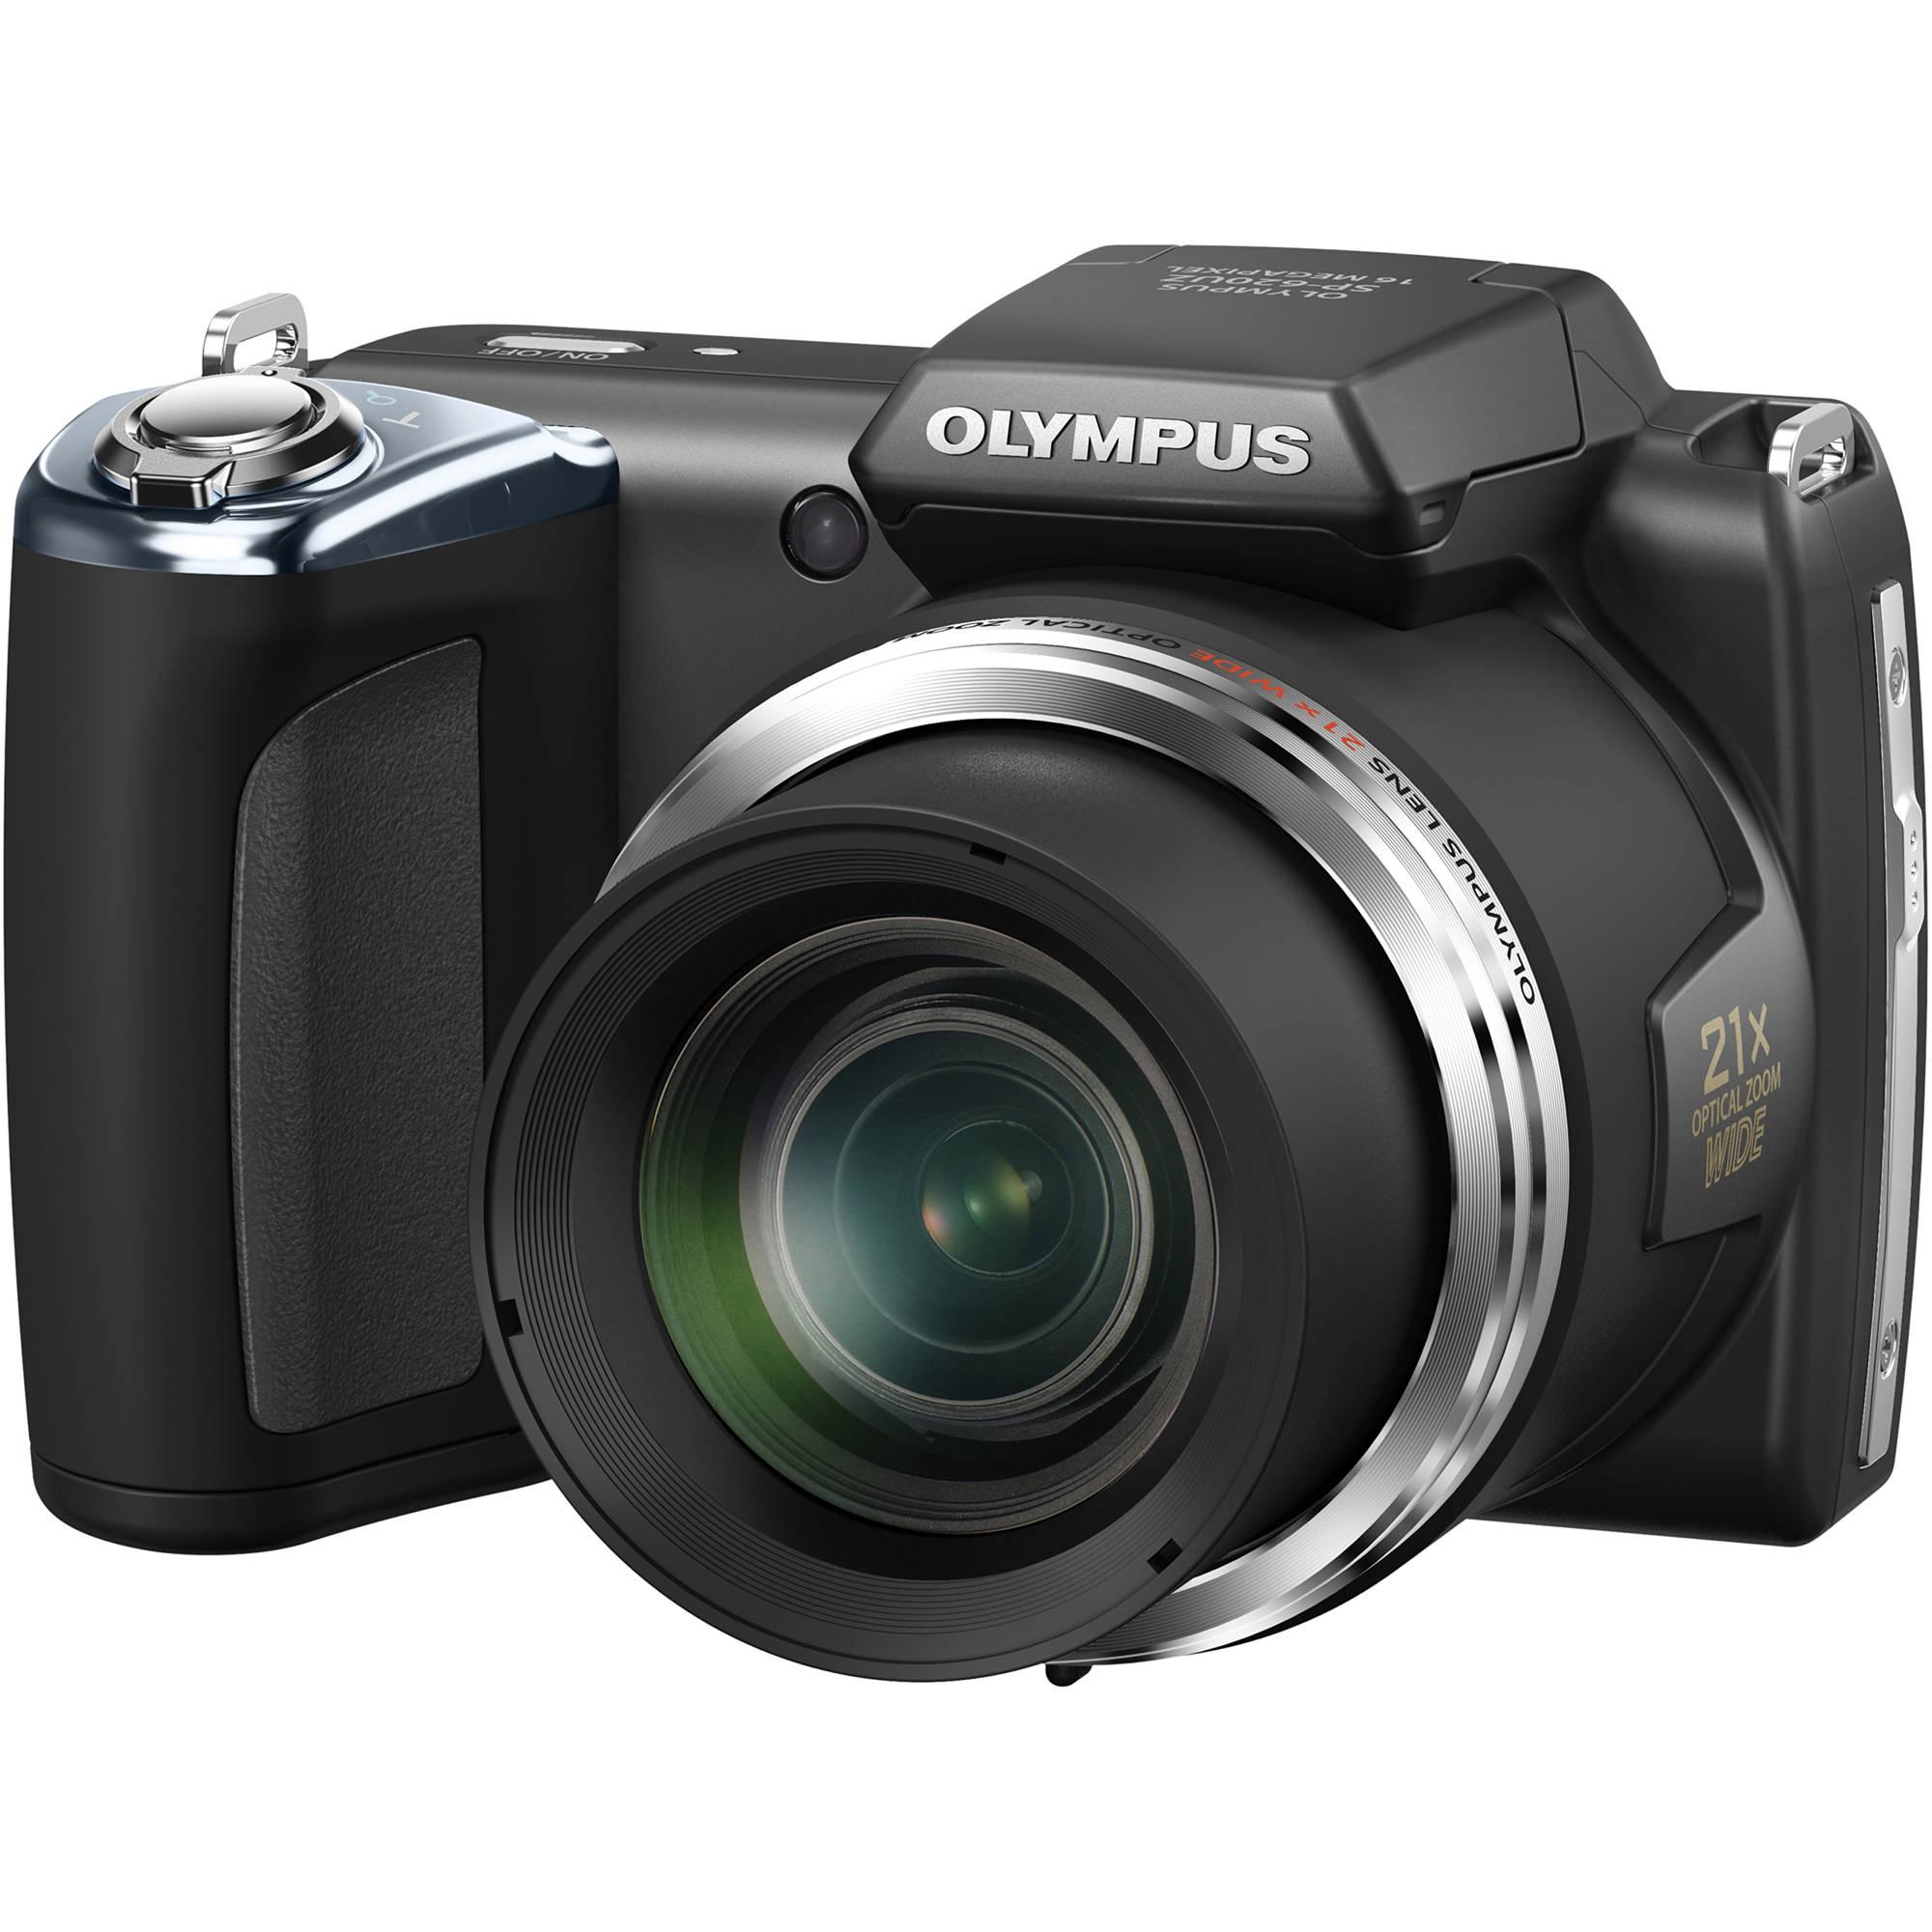 olympus sp 620uz digital camera black v103040bu000 b h photo rh bhphotovideo com Olympus SP 620Uz Camera Olympus SP 620Uz Camera